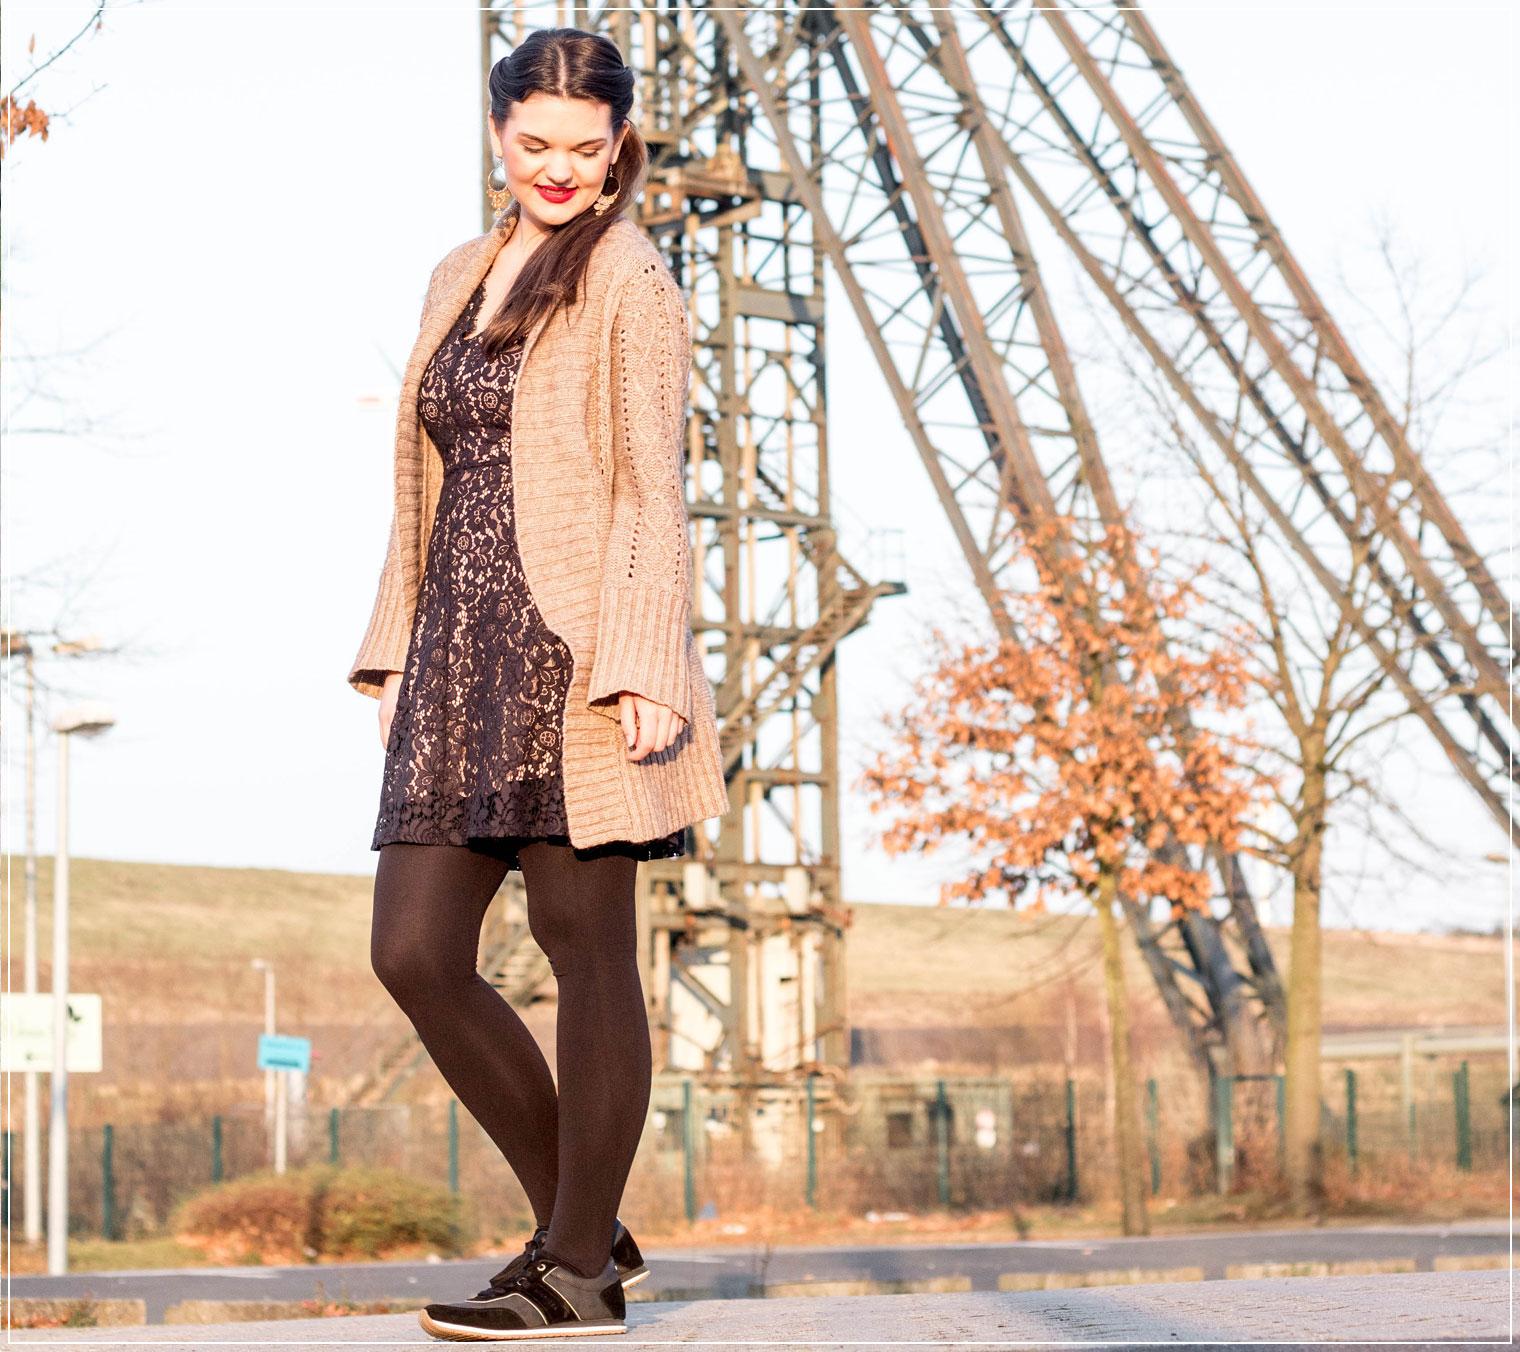 Sneaker, Planet Sports, Schuhshopping, Schuhe, Sportschuhe, Schuhliebe, Sneaker-Kauf, Ruhrgebiet, Bloggerin, Modeblog, Fashionblog